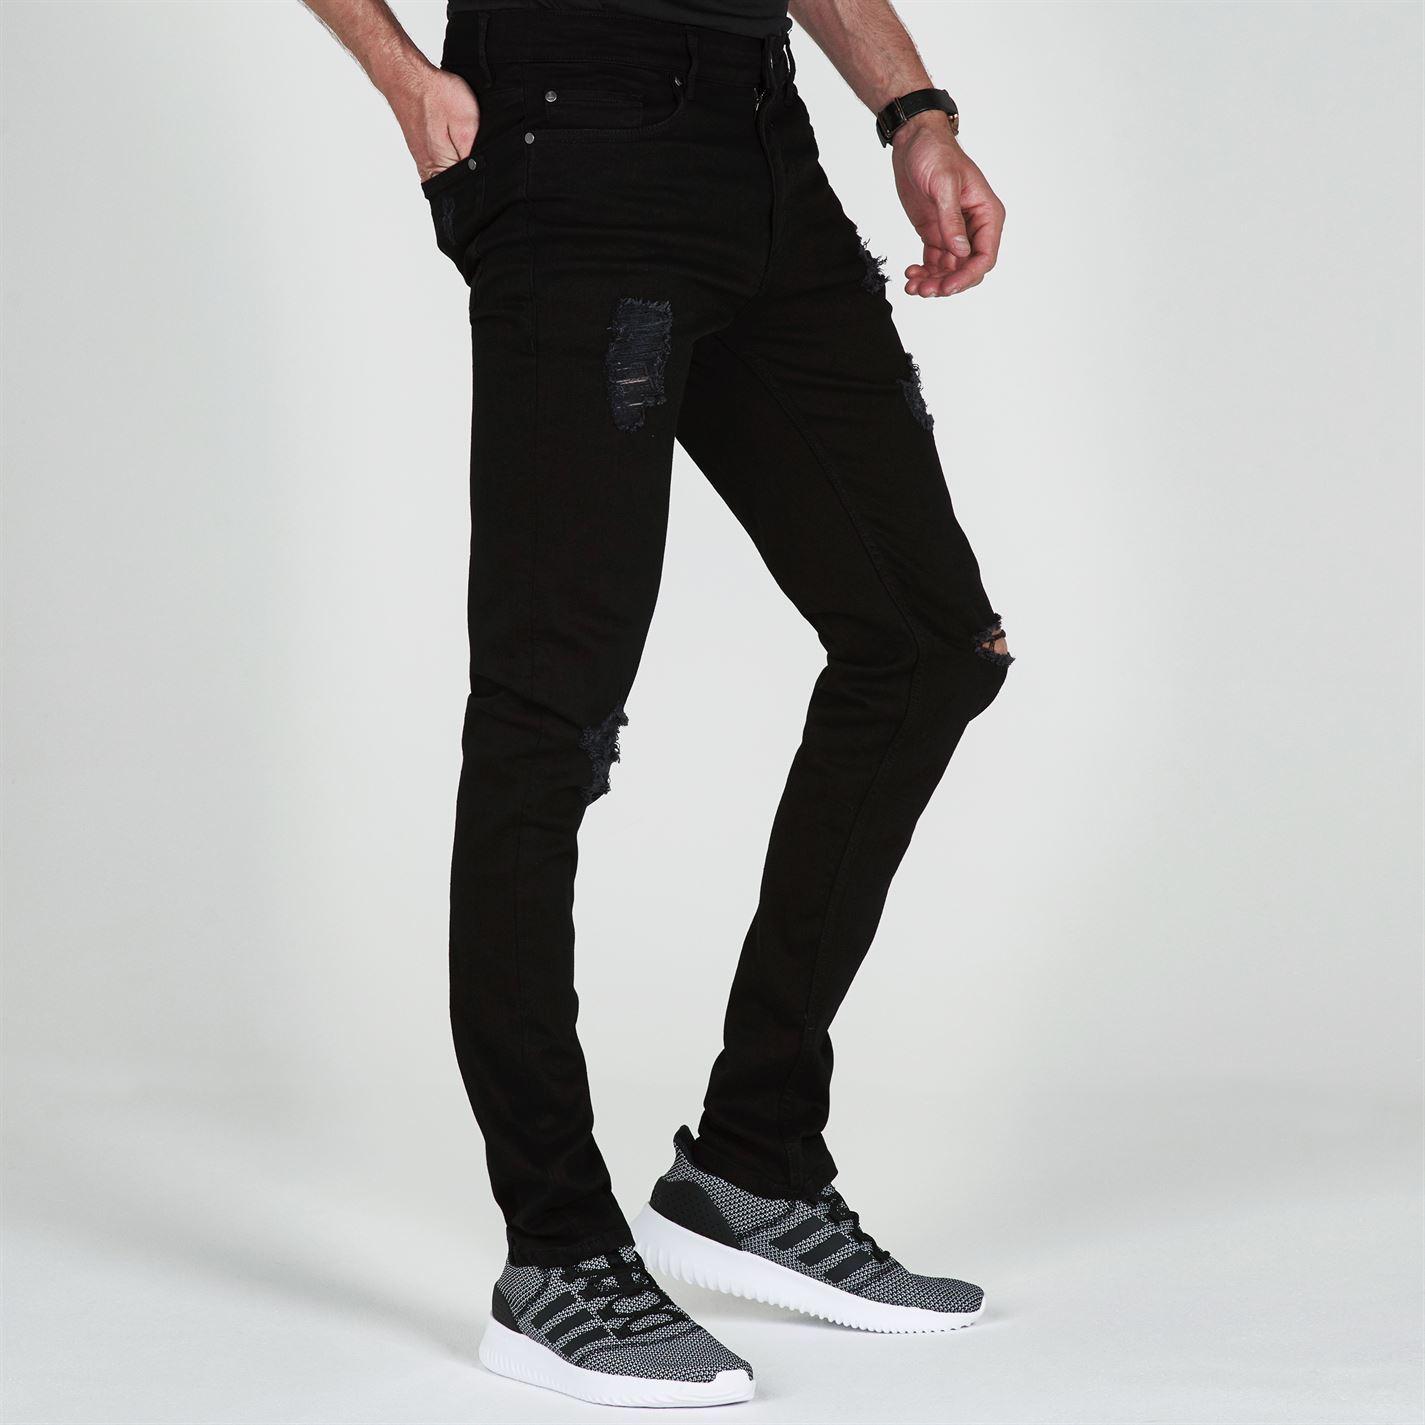 Jeans-Denim-Firetrap-Skinny-Mens-Trouser-Pants-Black thumbnail 14